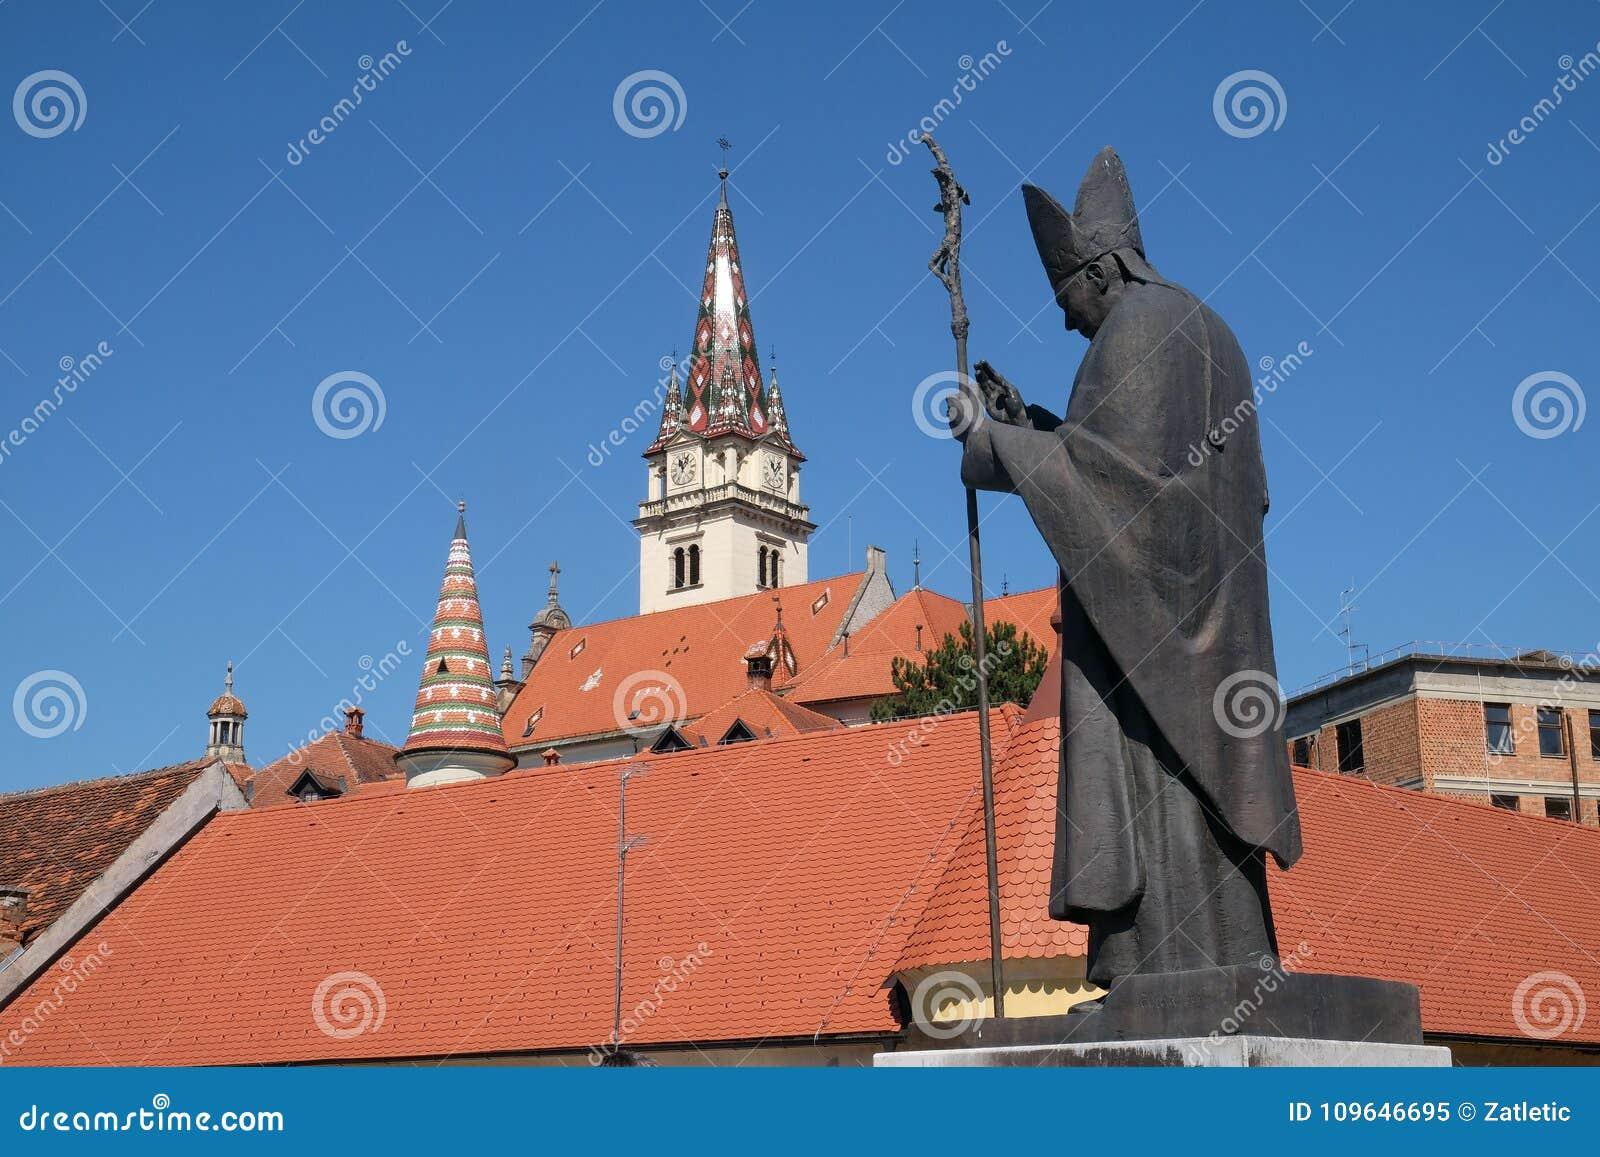 Statue de pape John Paul II, hypothèse de basilique de Vierge Marie en Marija Bistrica, Croatie